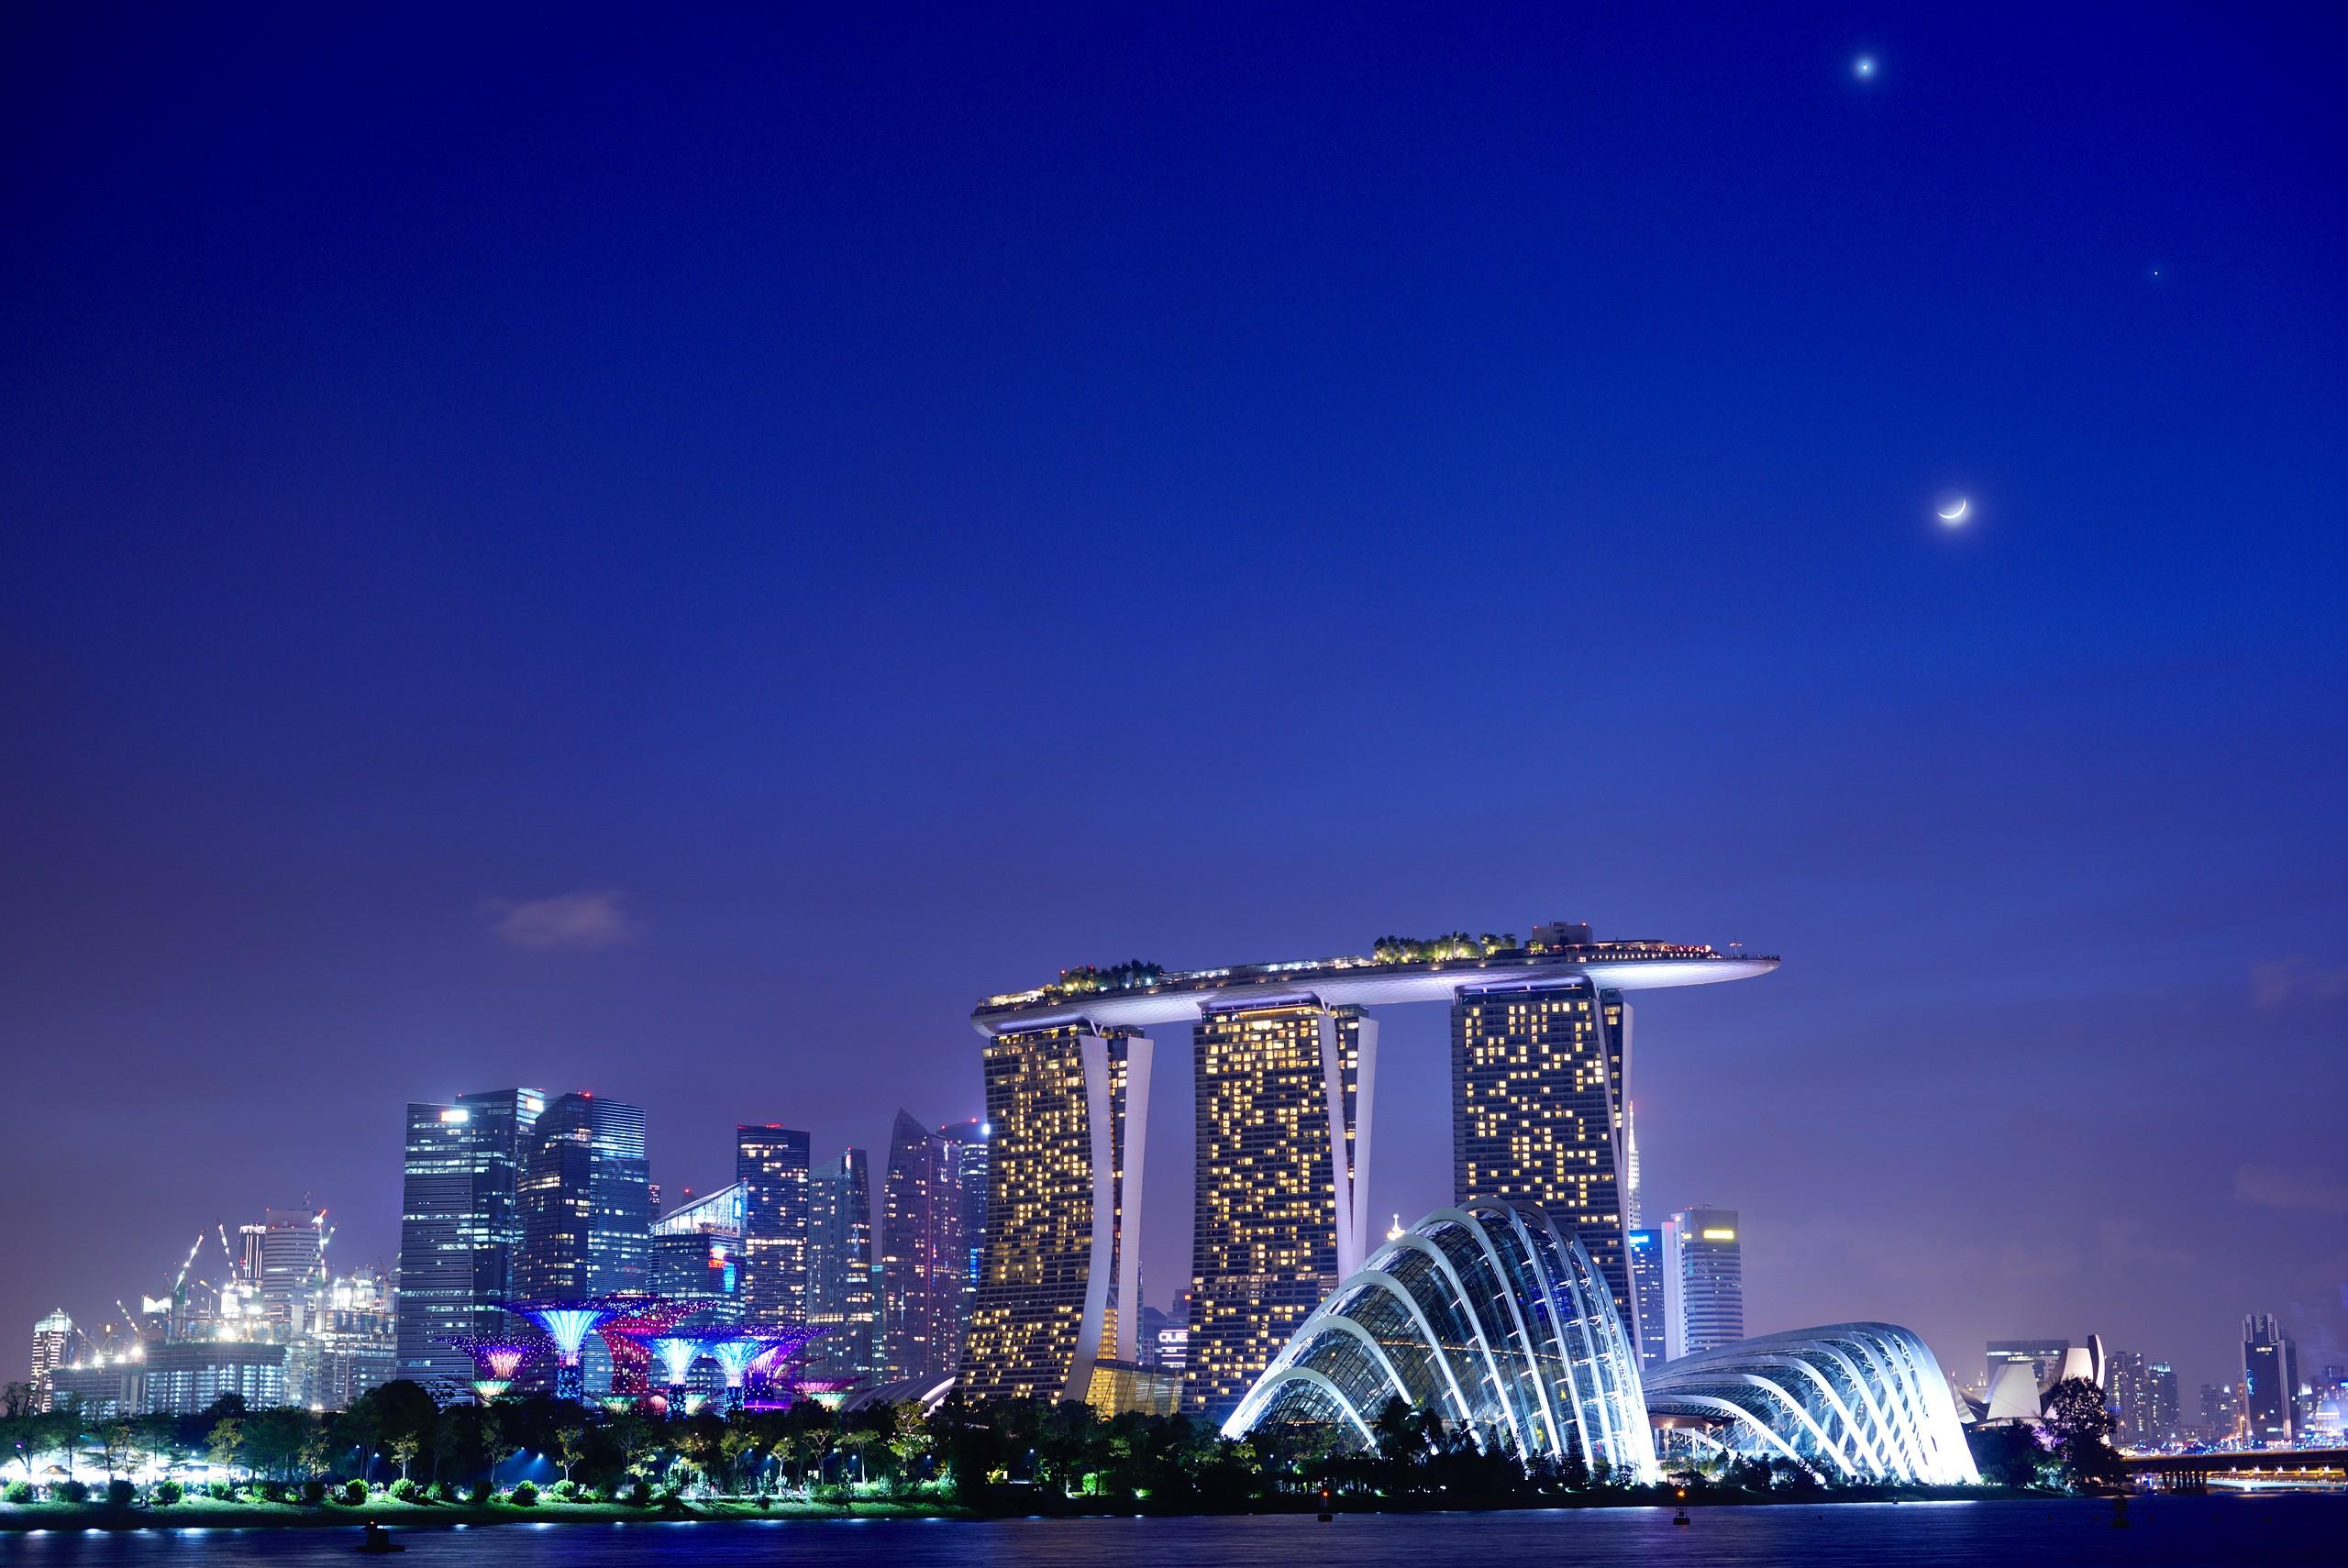 File:Conjunction of Moon, Venus and Jupiter over Marina Bay